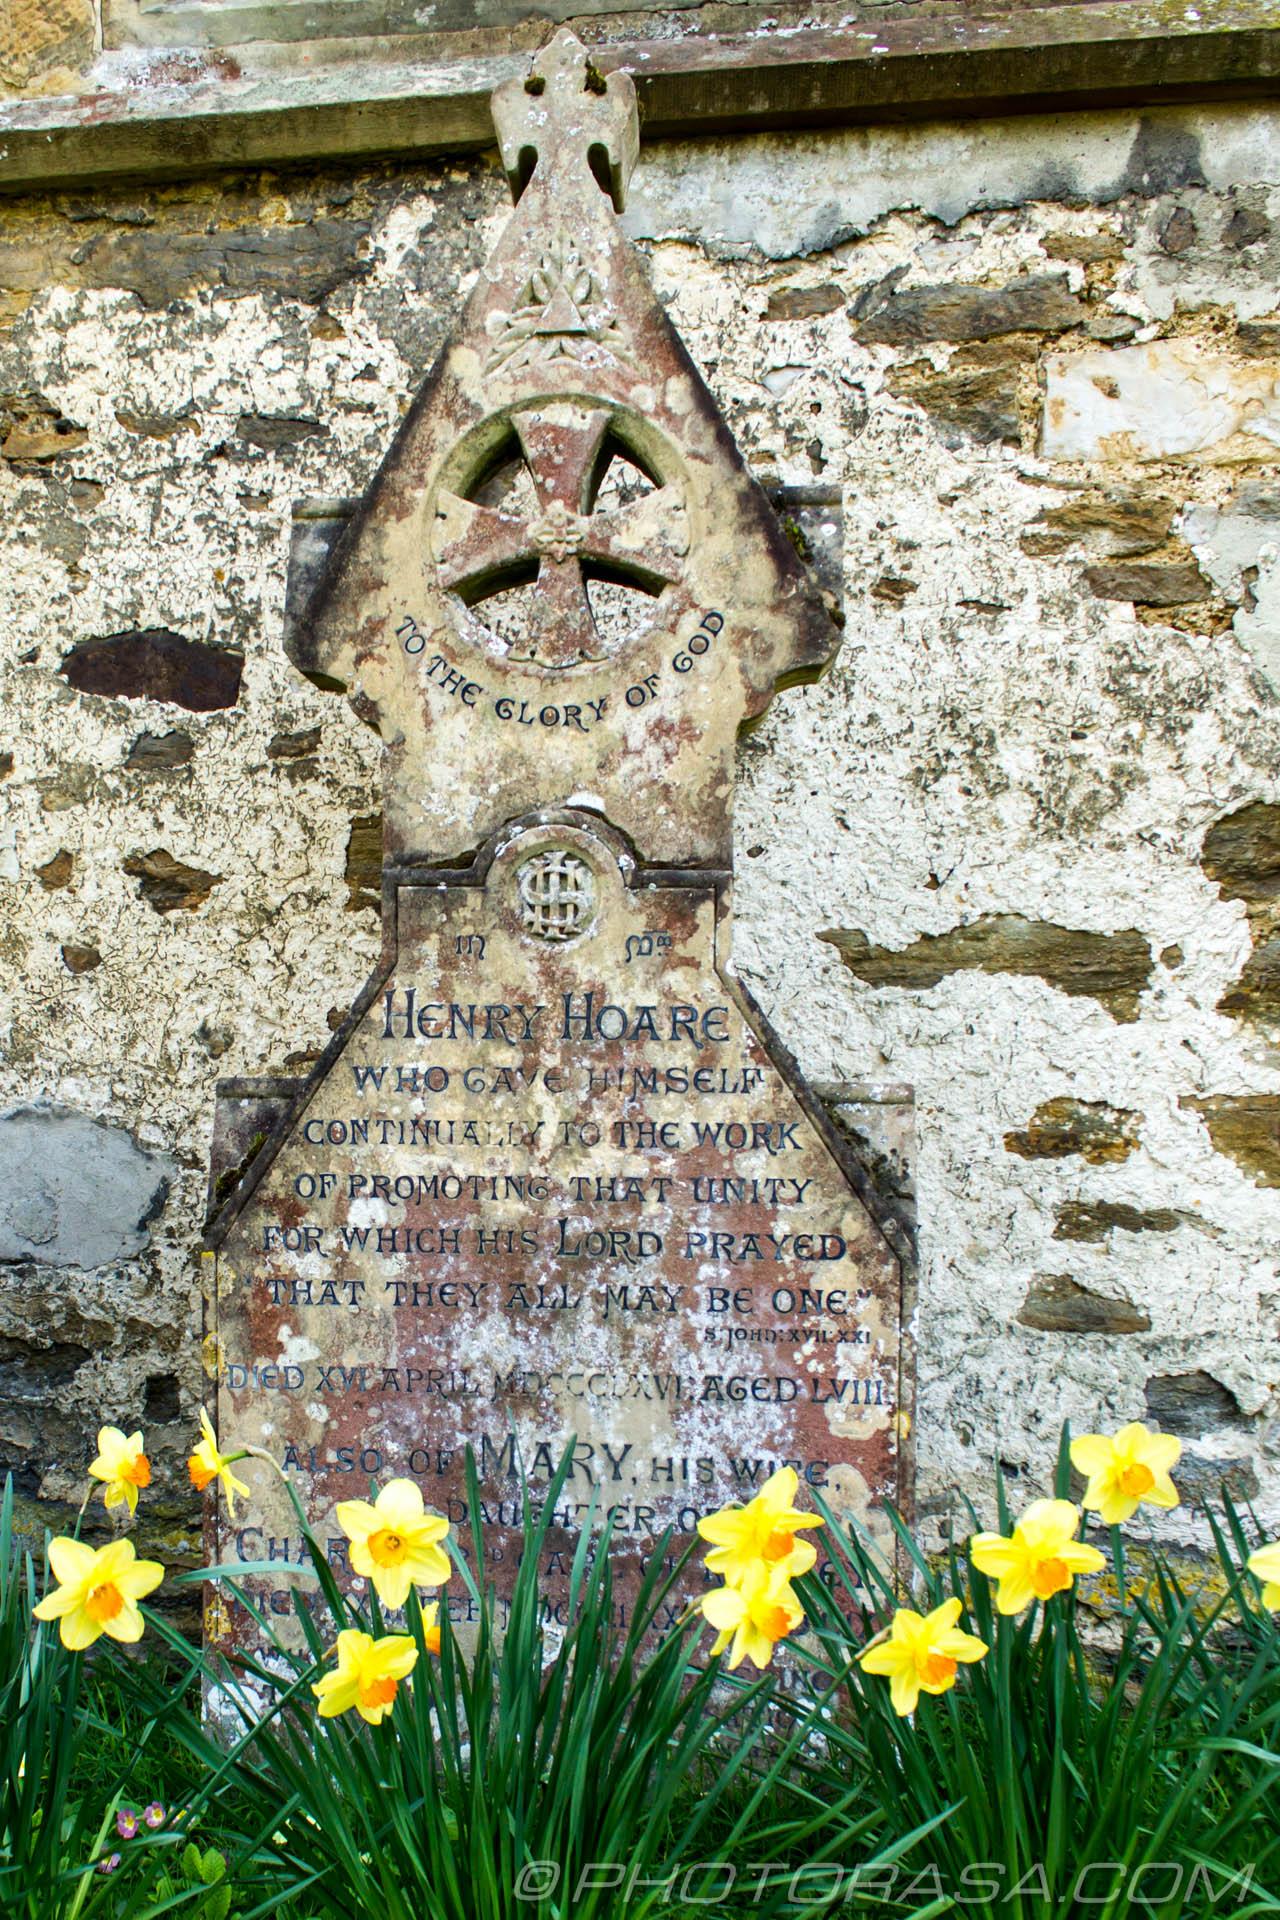 https://photorasa.com/saints-church-staplehurst-kent/decorative-marble-gravestone-2/